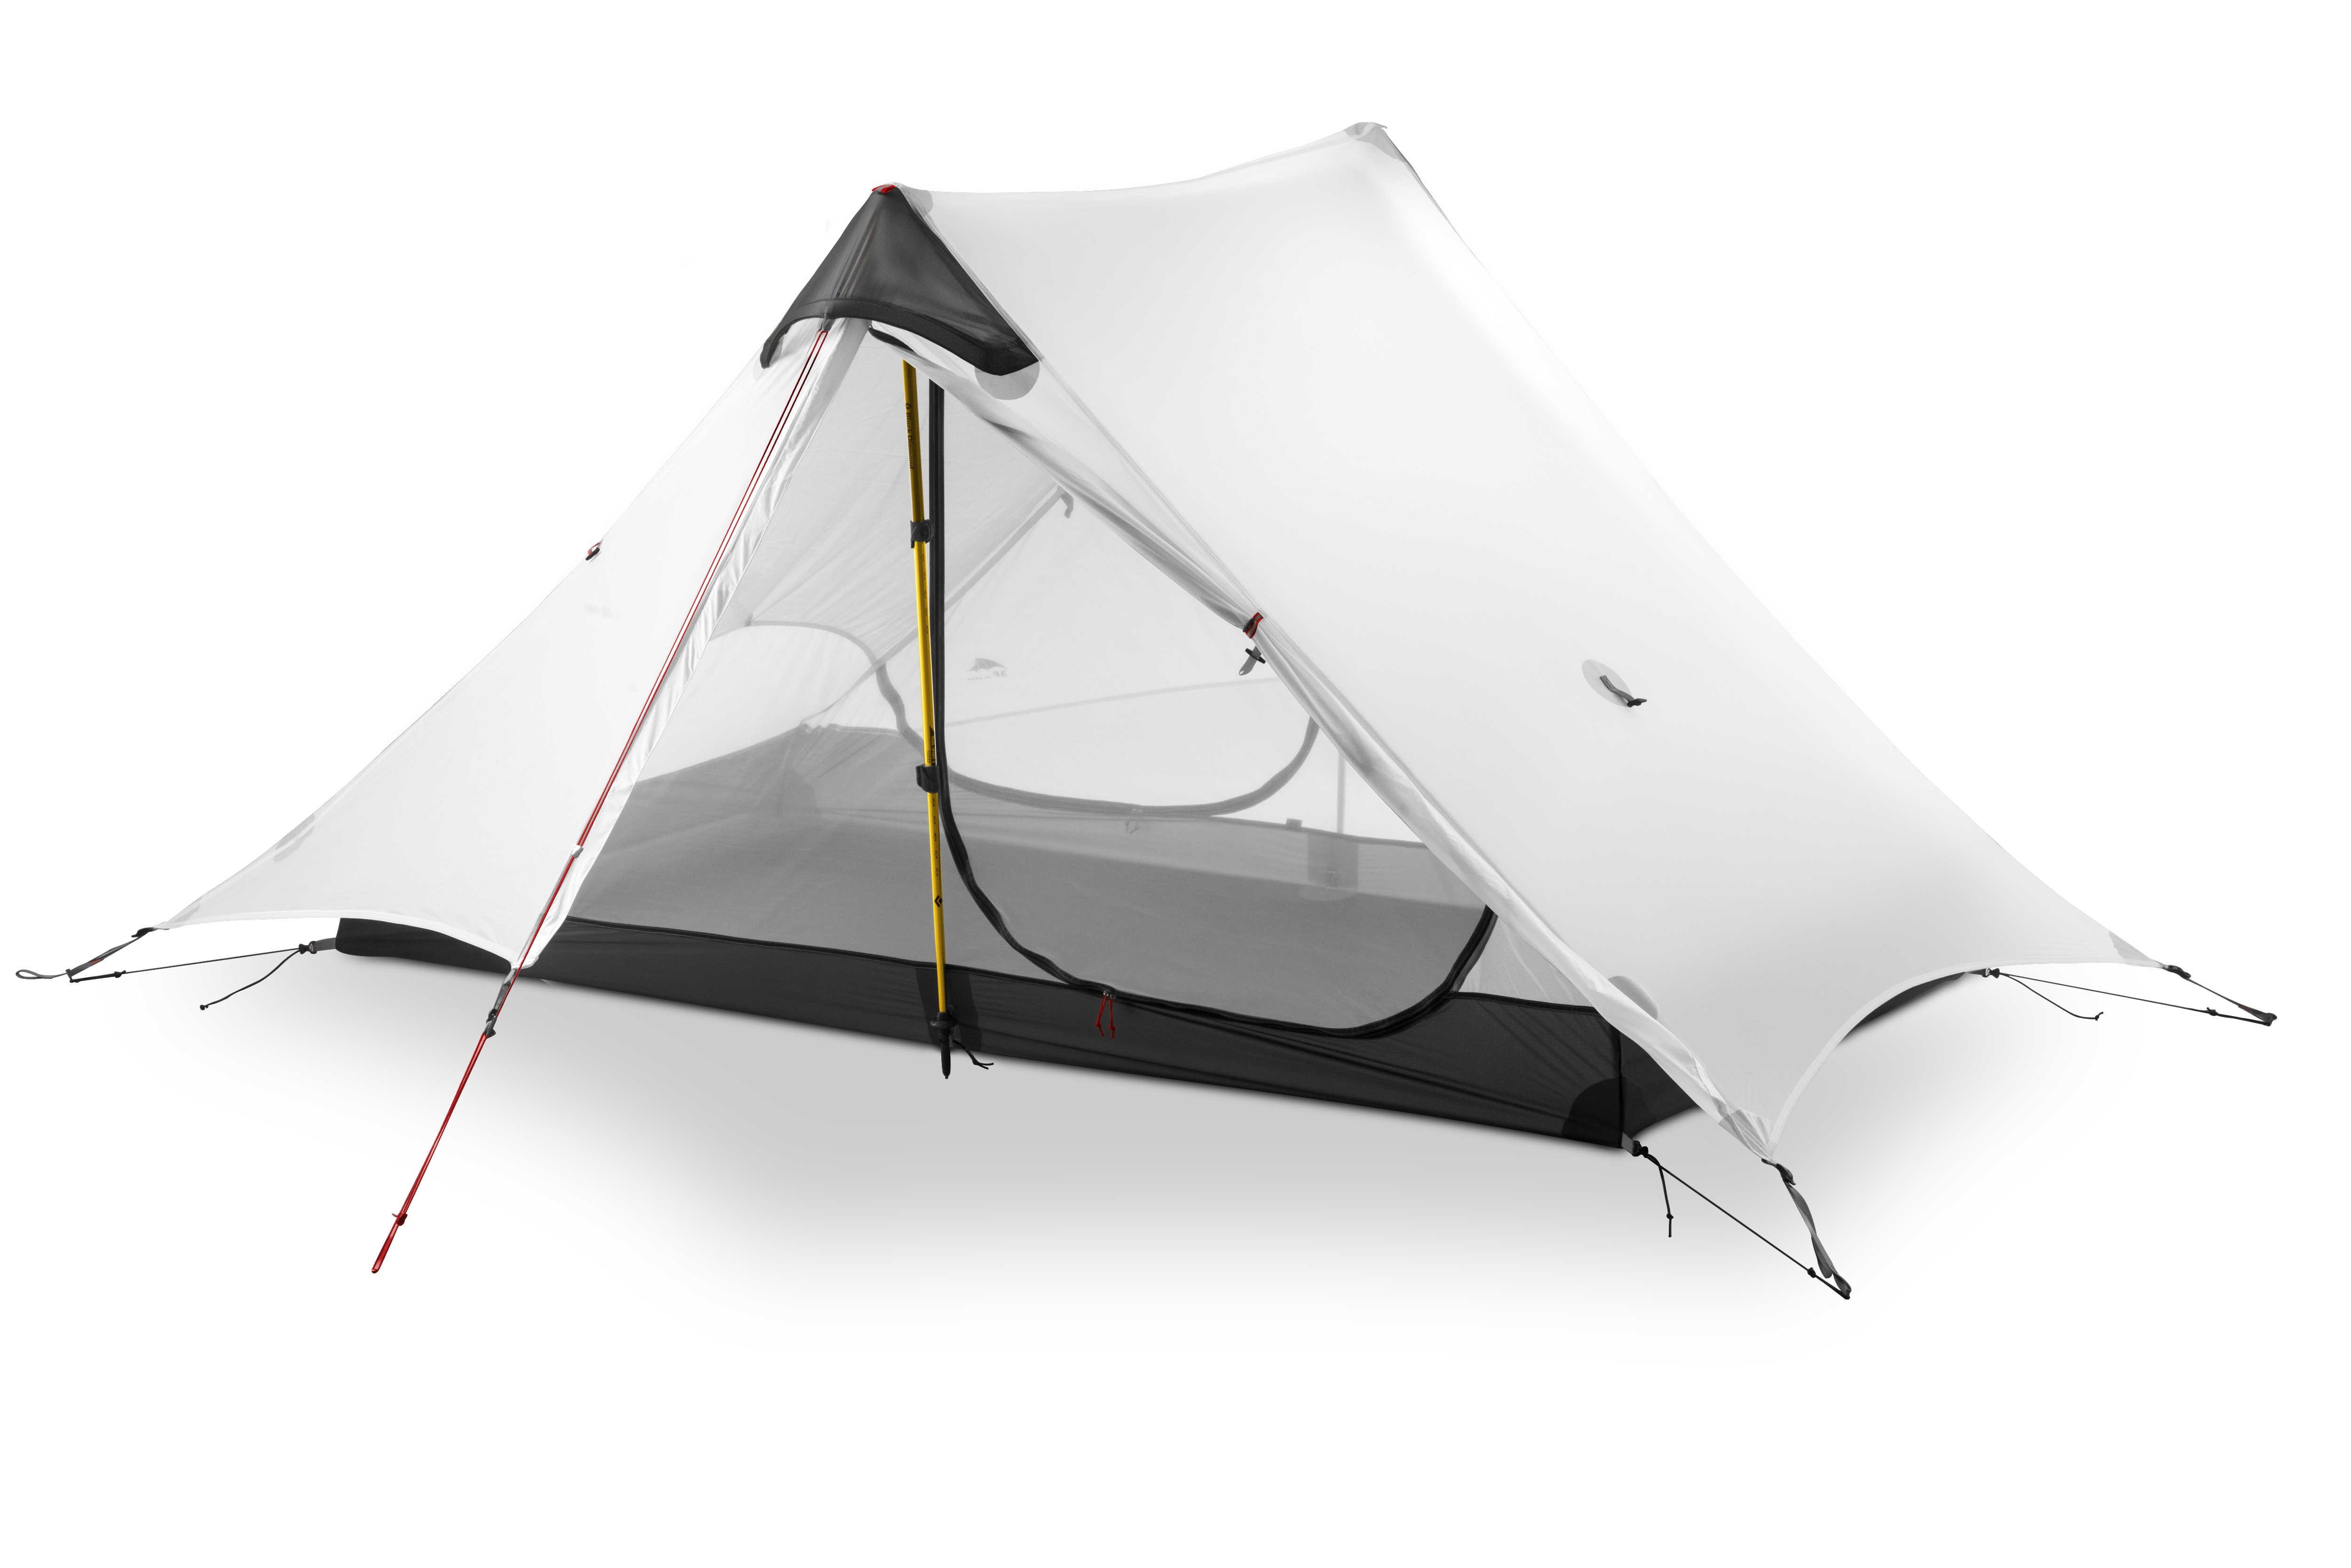 3F UL dişli 2019 lanshan 2 Rodless çadır 2 kişi profesyonel 15D Silnylon çadır açık Ultralight kamp çadırı 3 4 sezon çadır